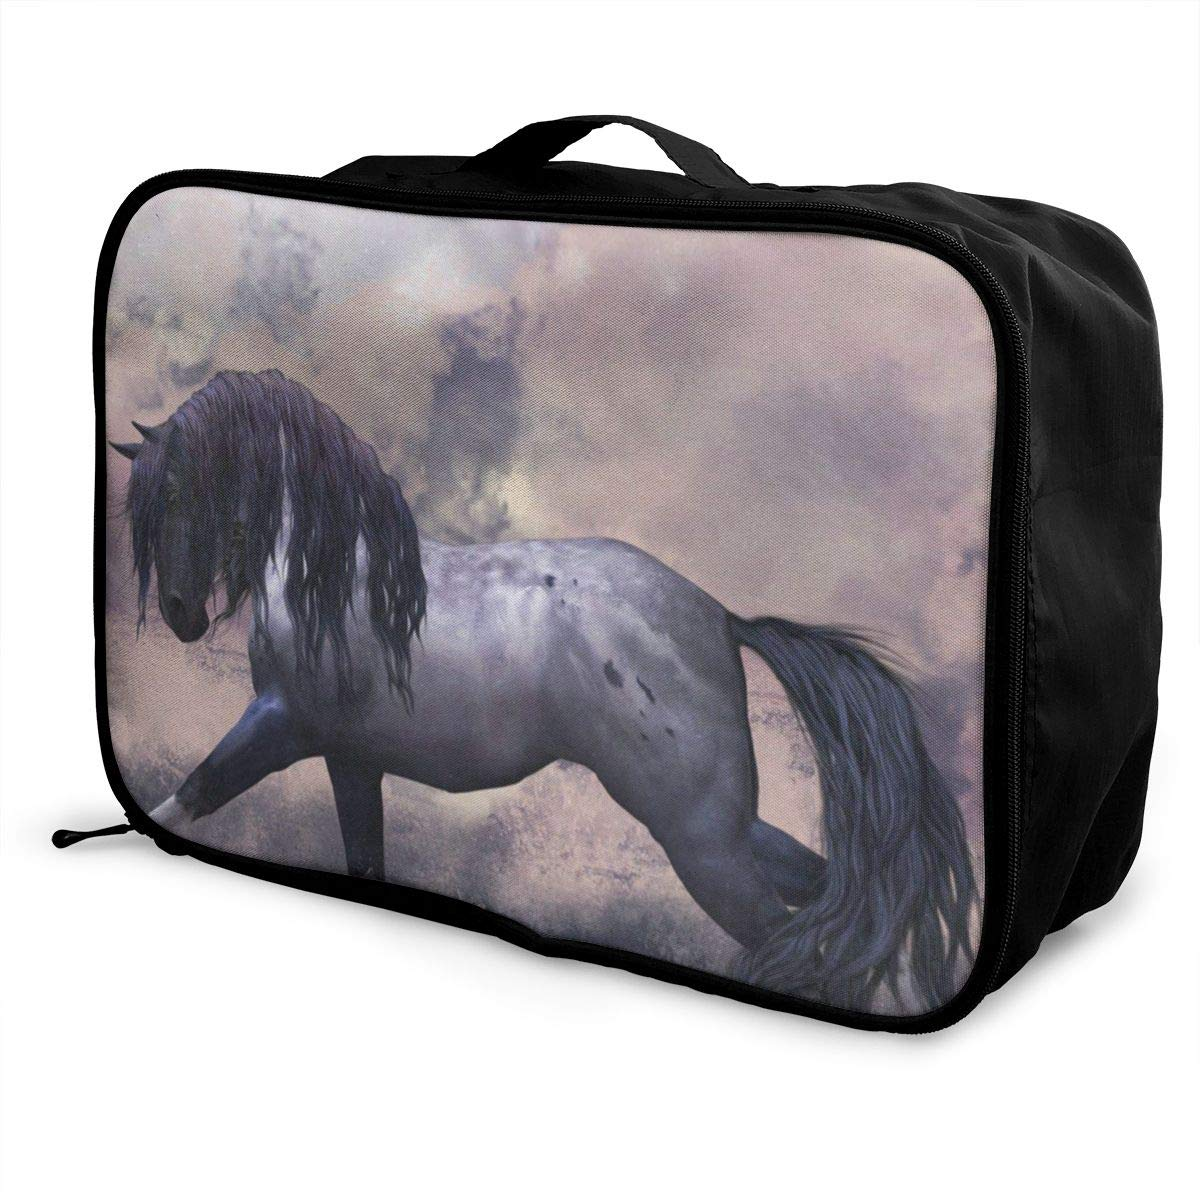 Sports Camping Travel Luggage Nylon Galaxy Nebula Solar System Planet Hanging Bag Tote Bags